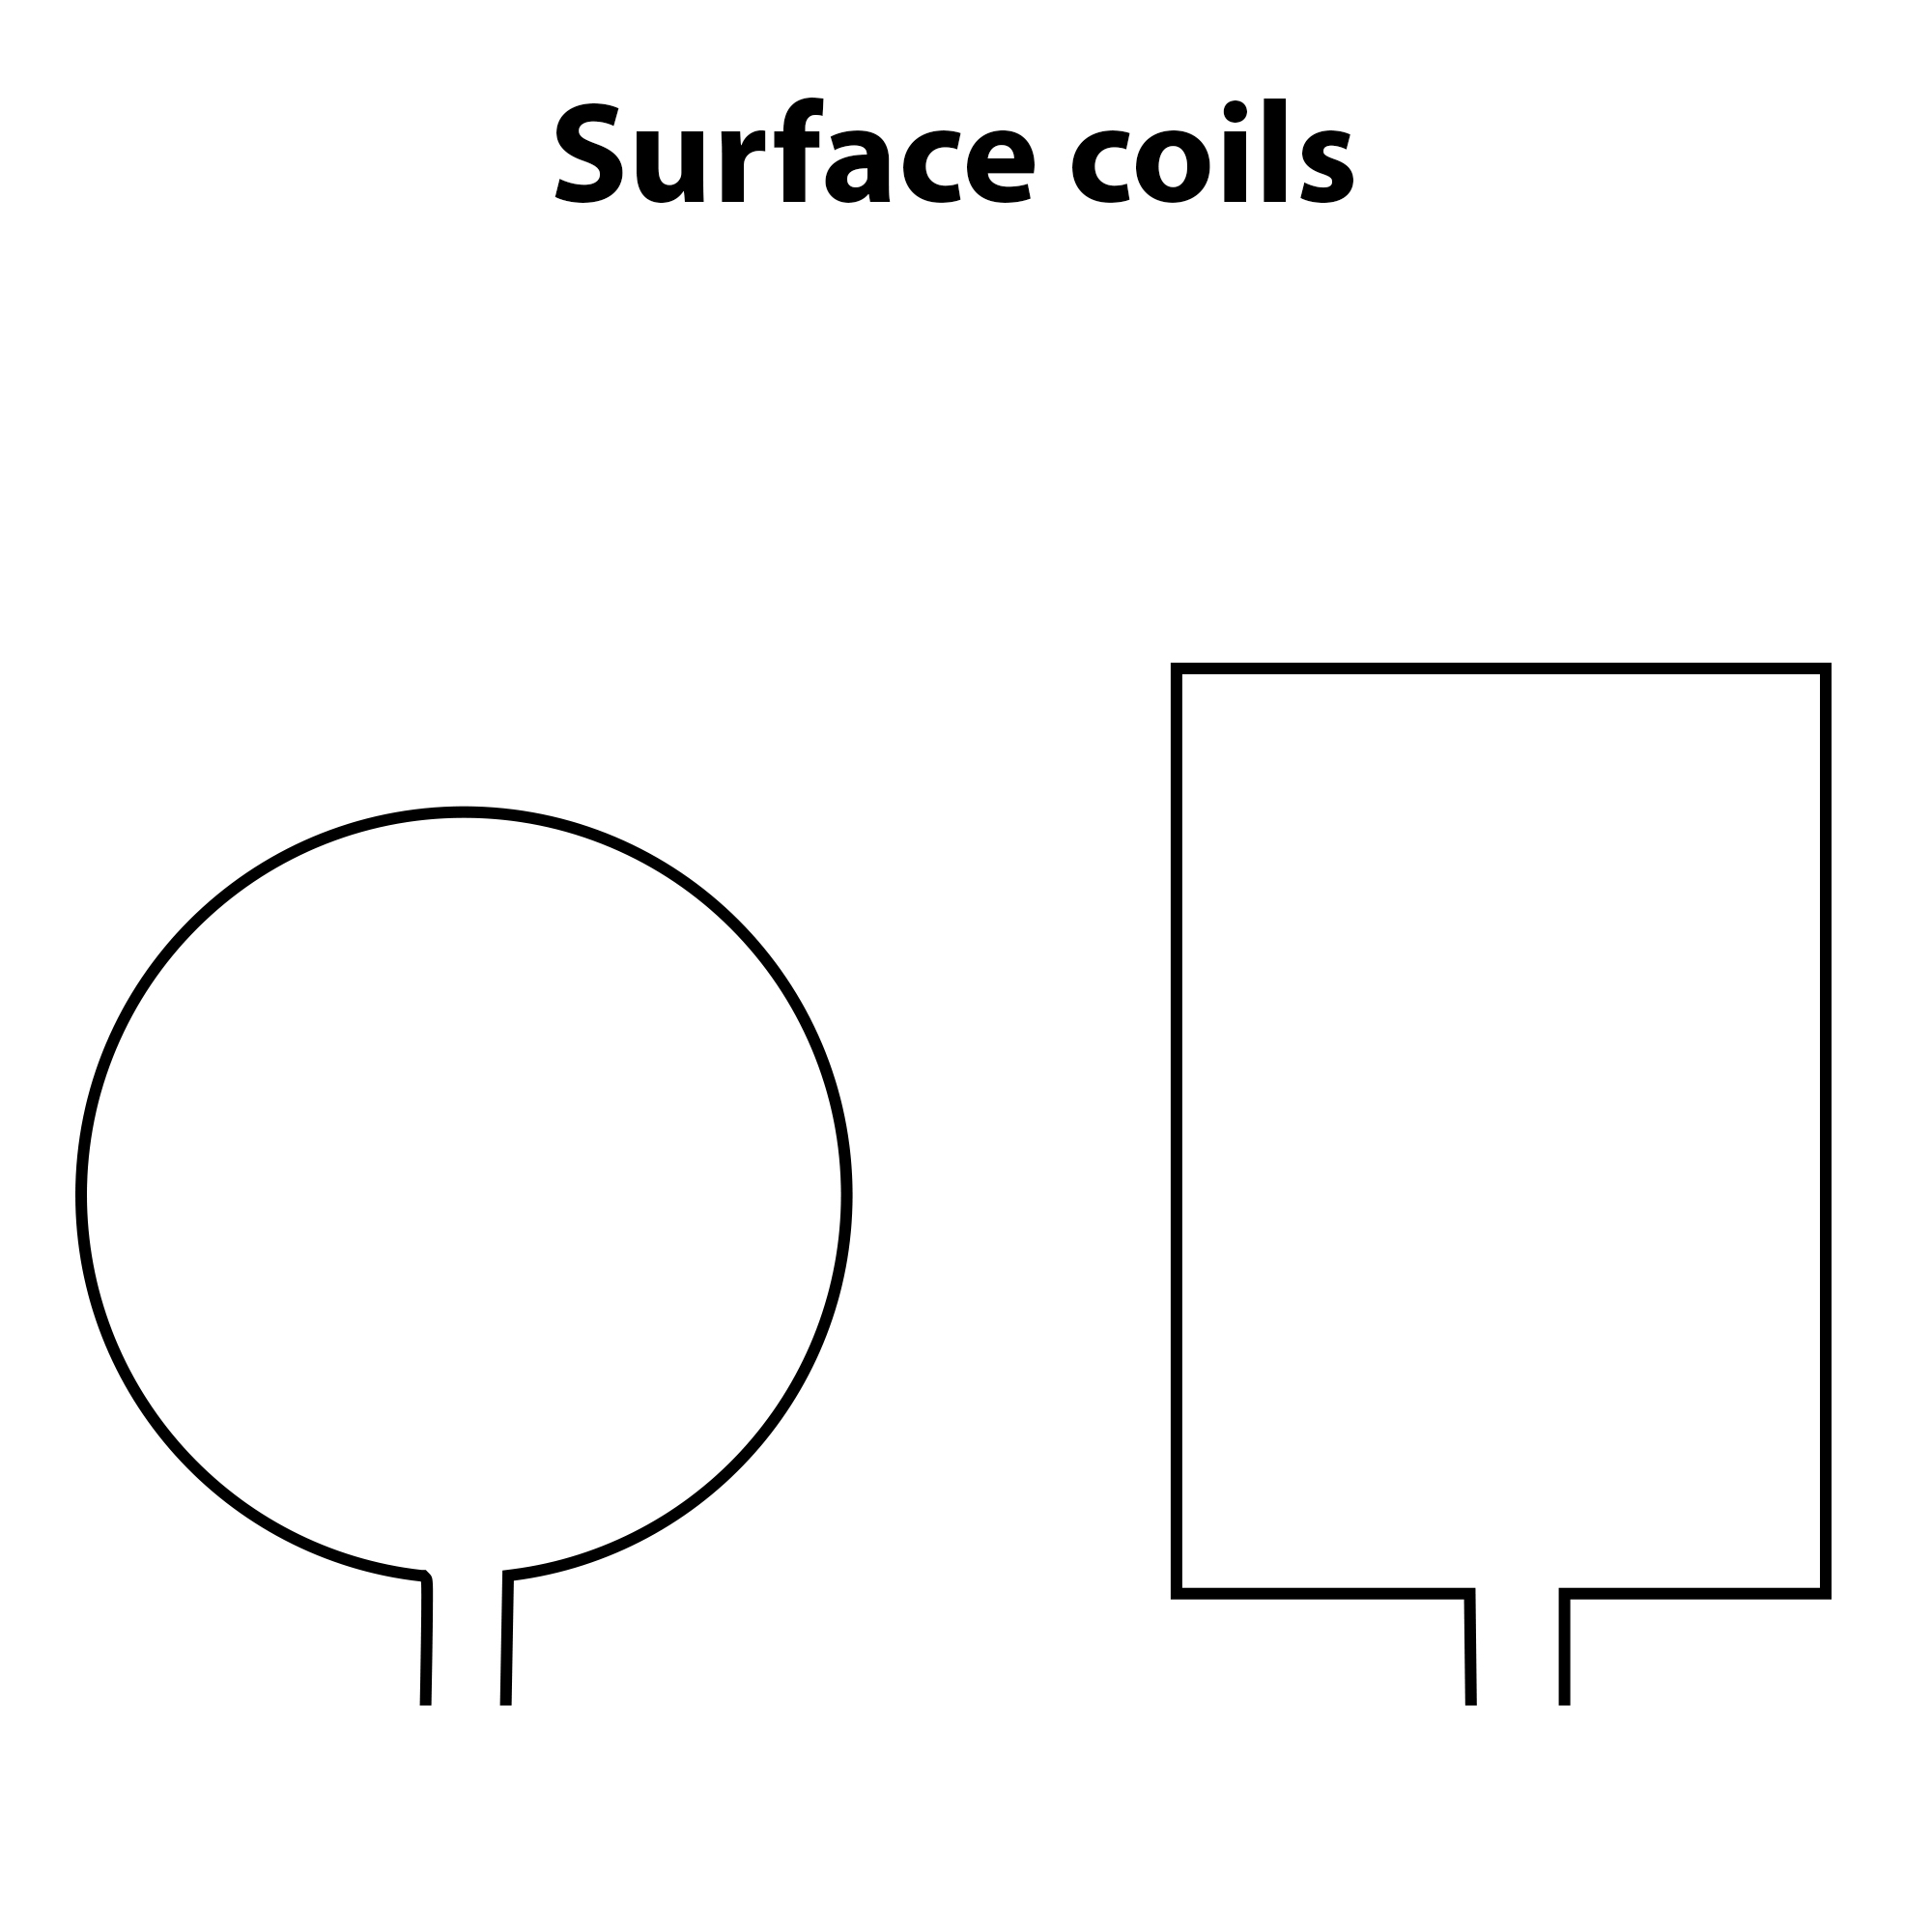 Mri Physics Diagrams